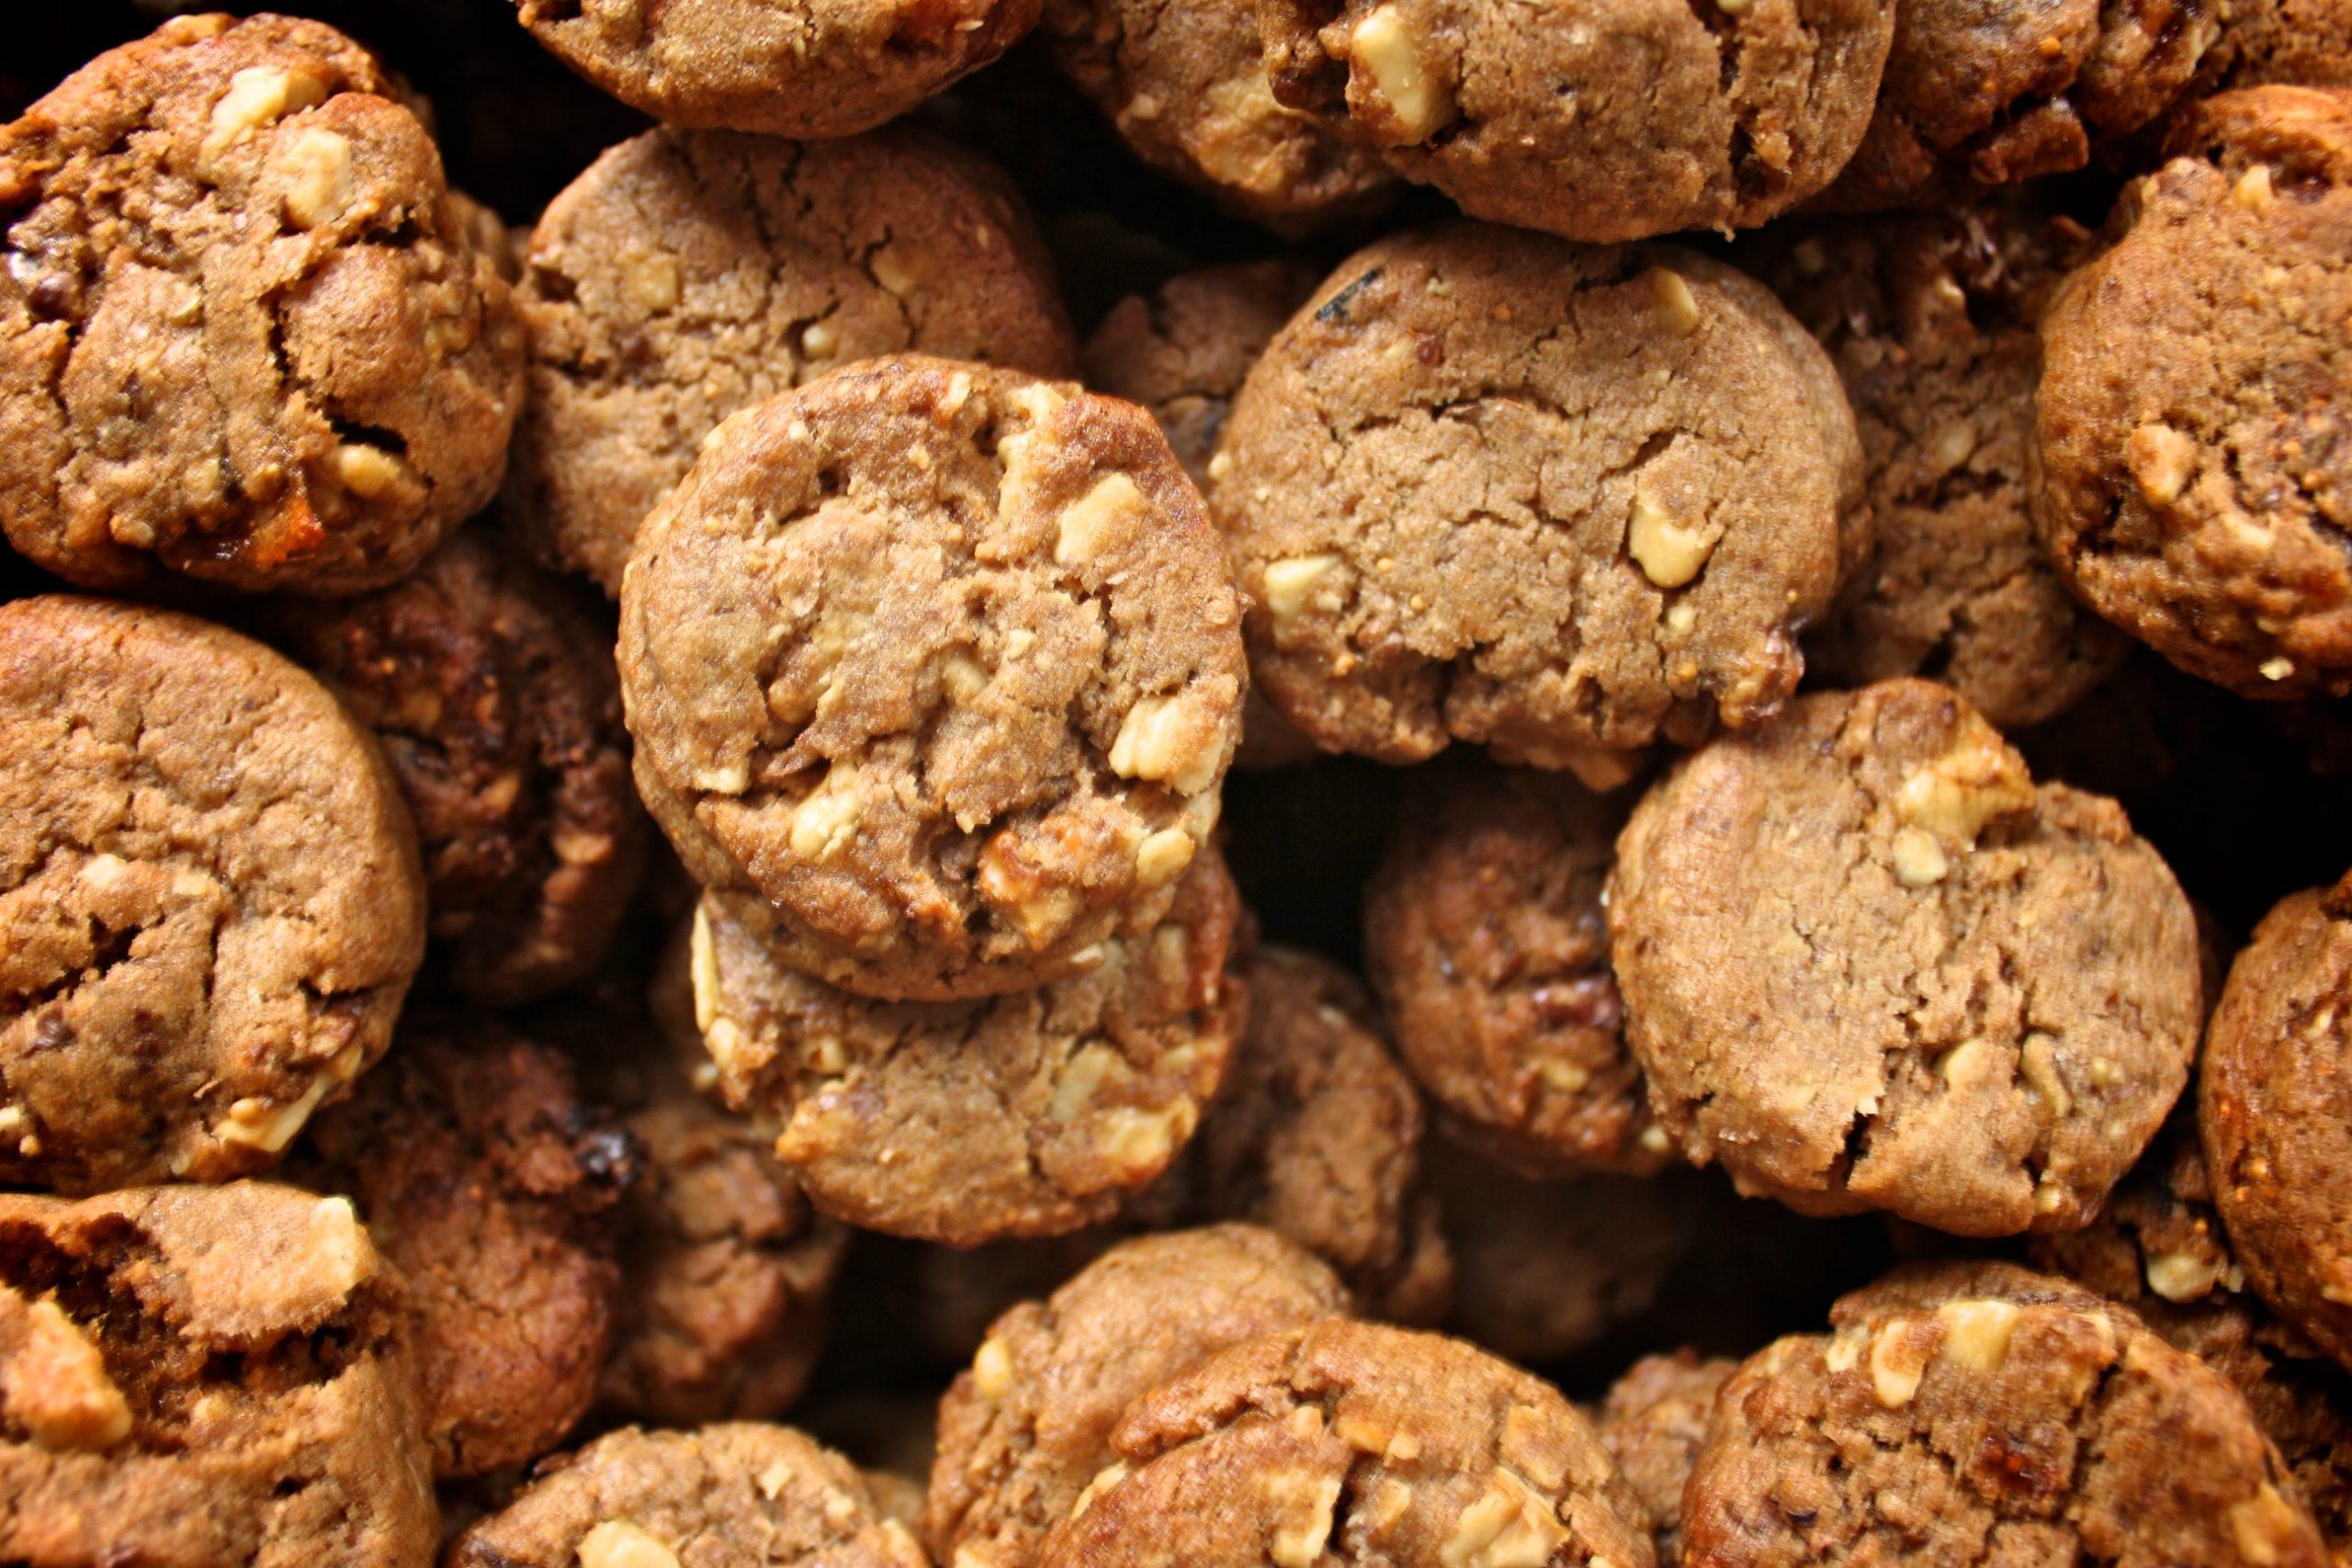 Ukusni keksi sa suhim smokvama